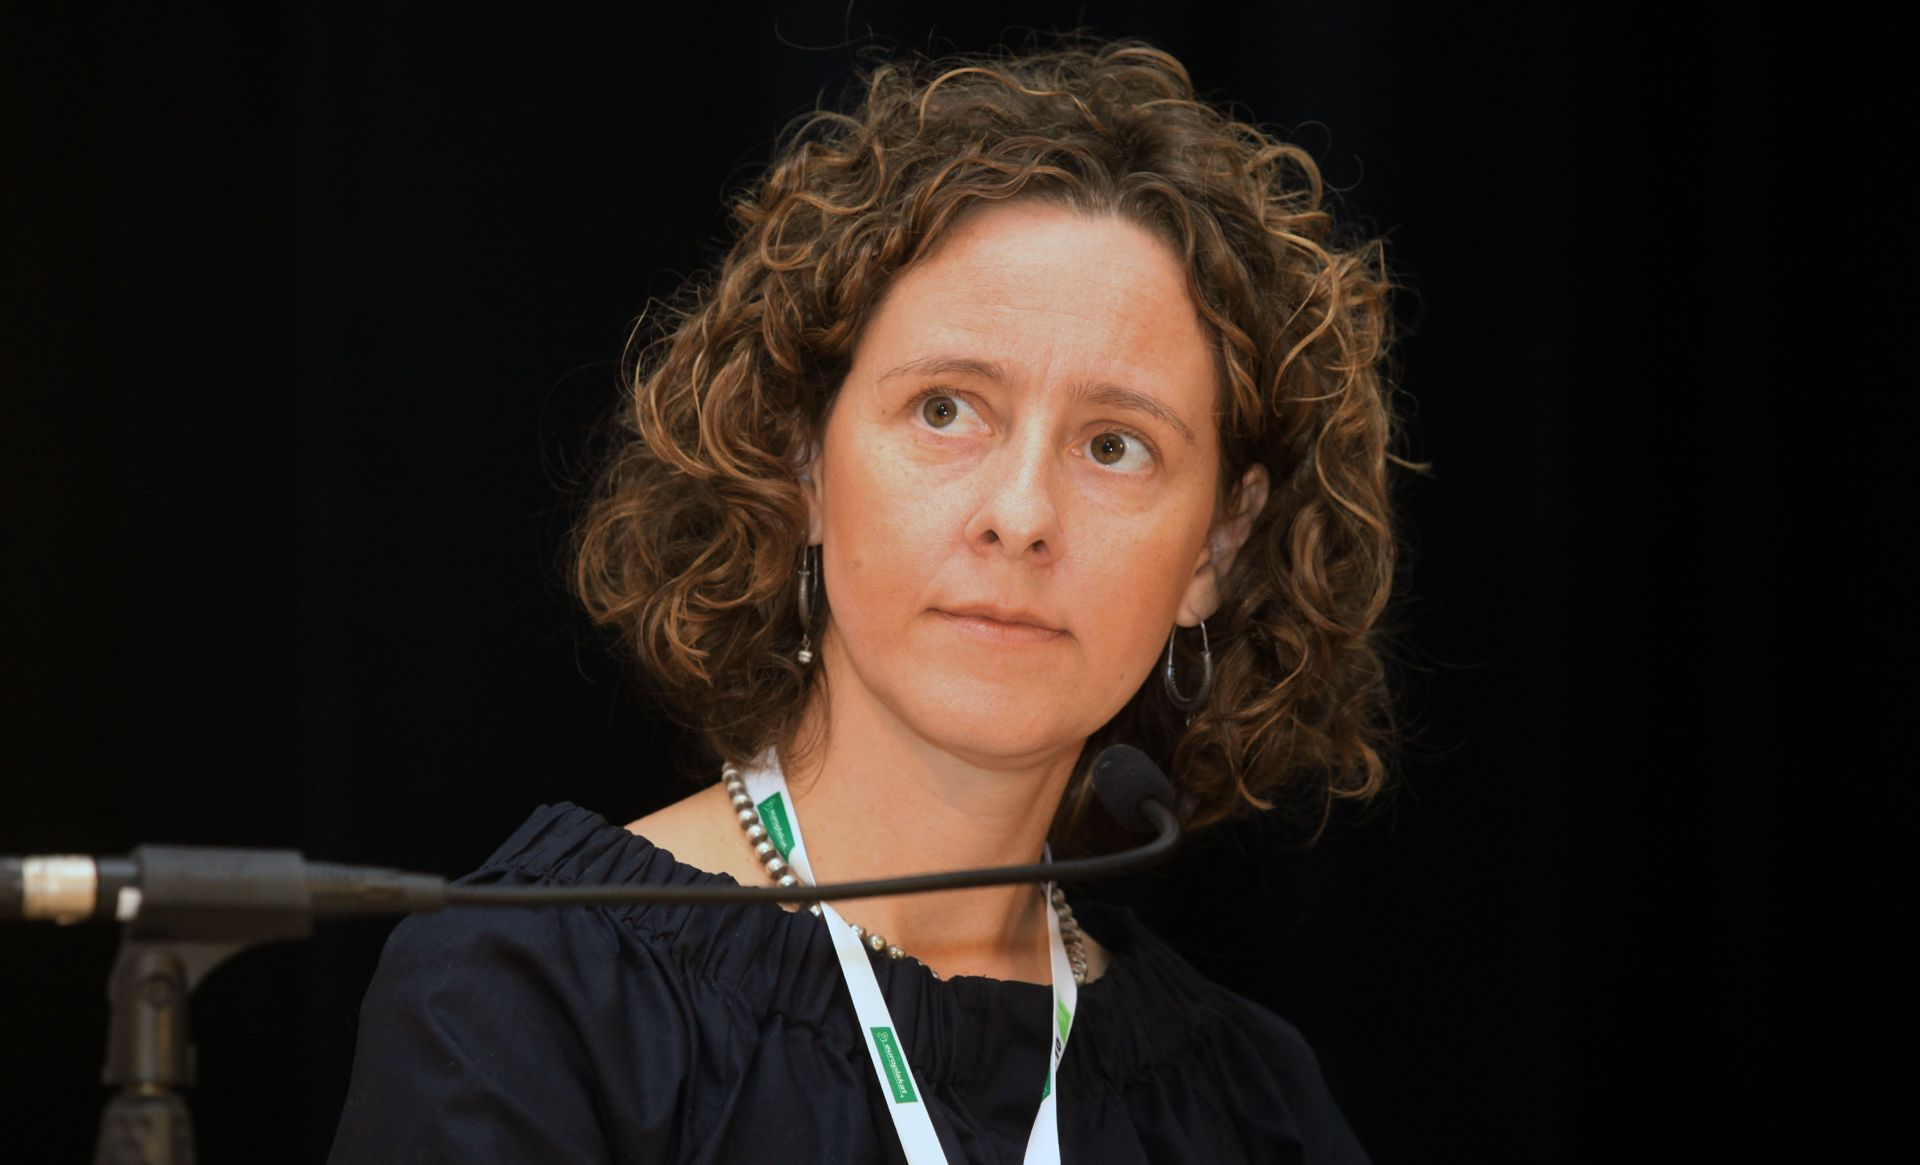 Nina Obuljen ipak nova ministrica kulture?